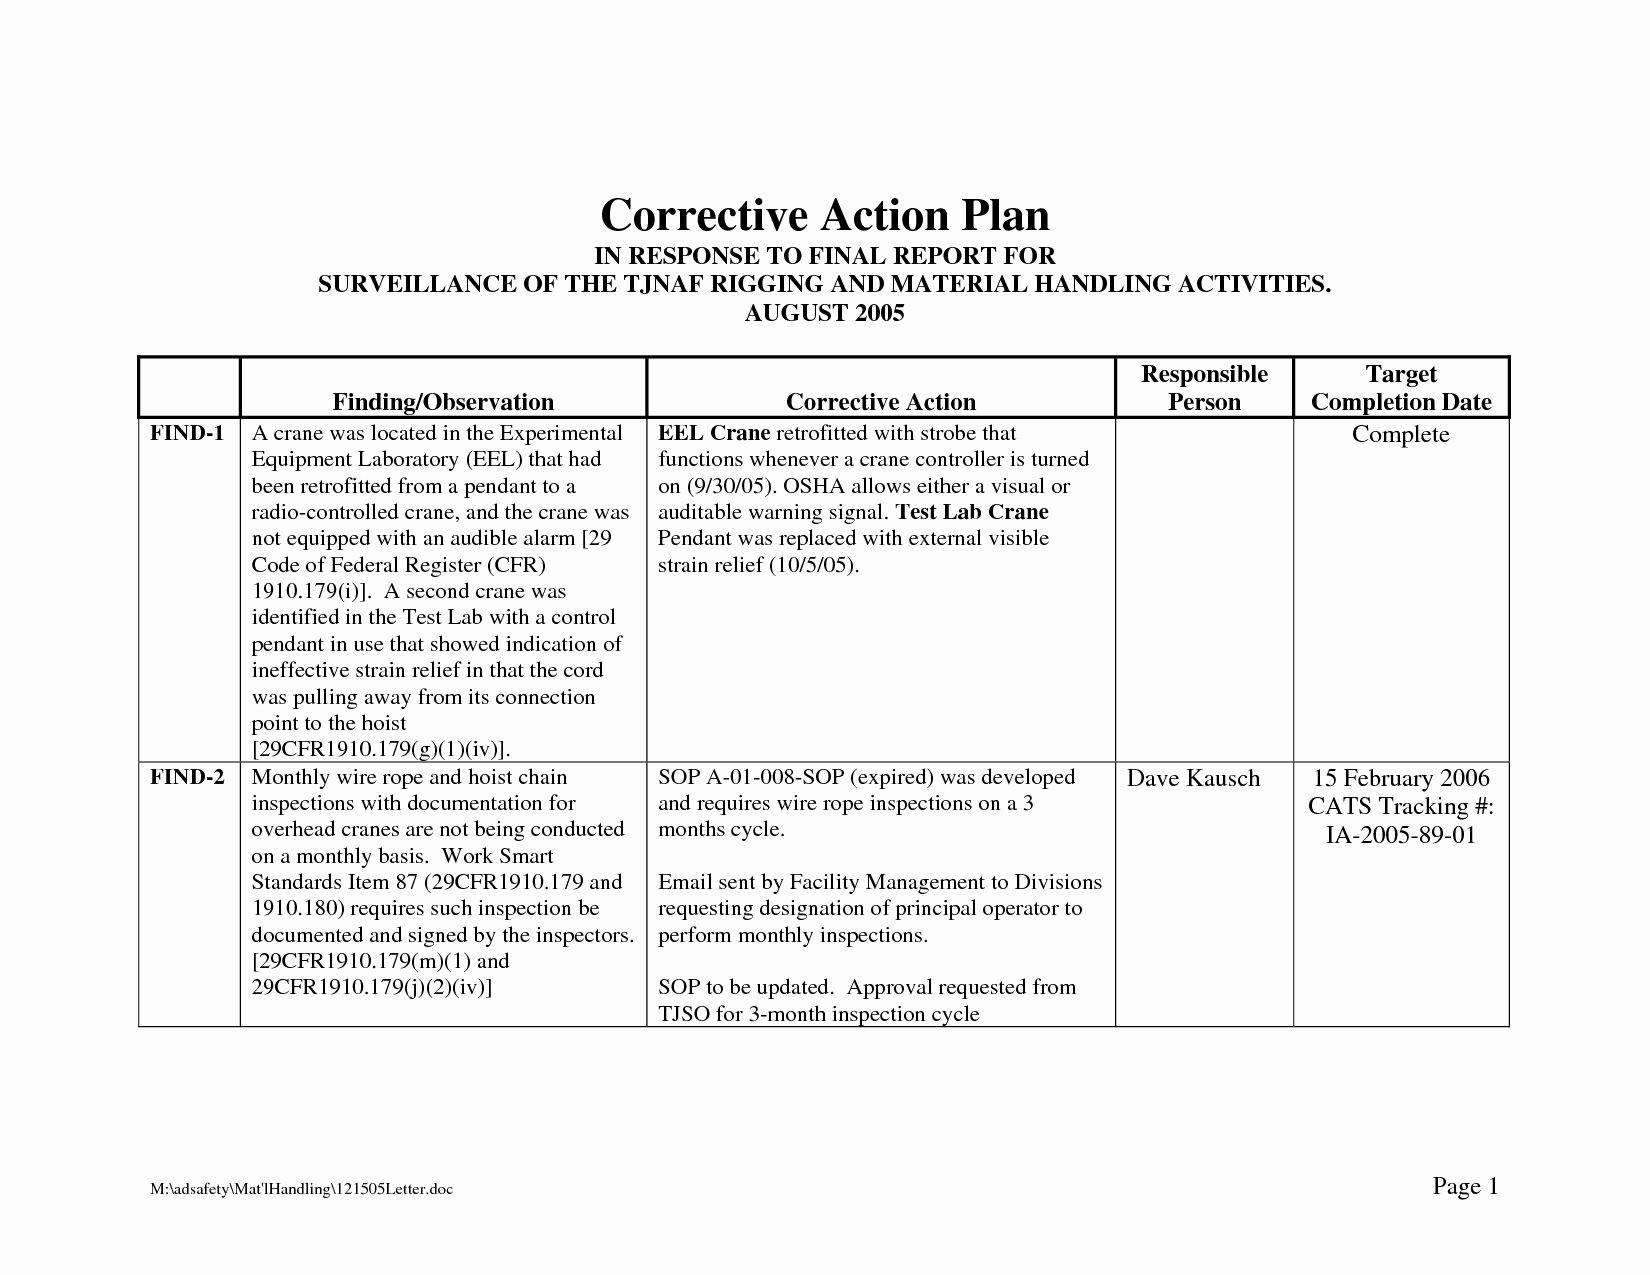 Corrective Action Plan Template Beautiful Corrective